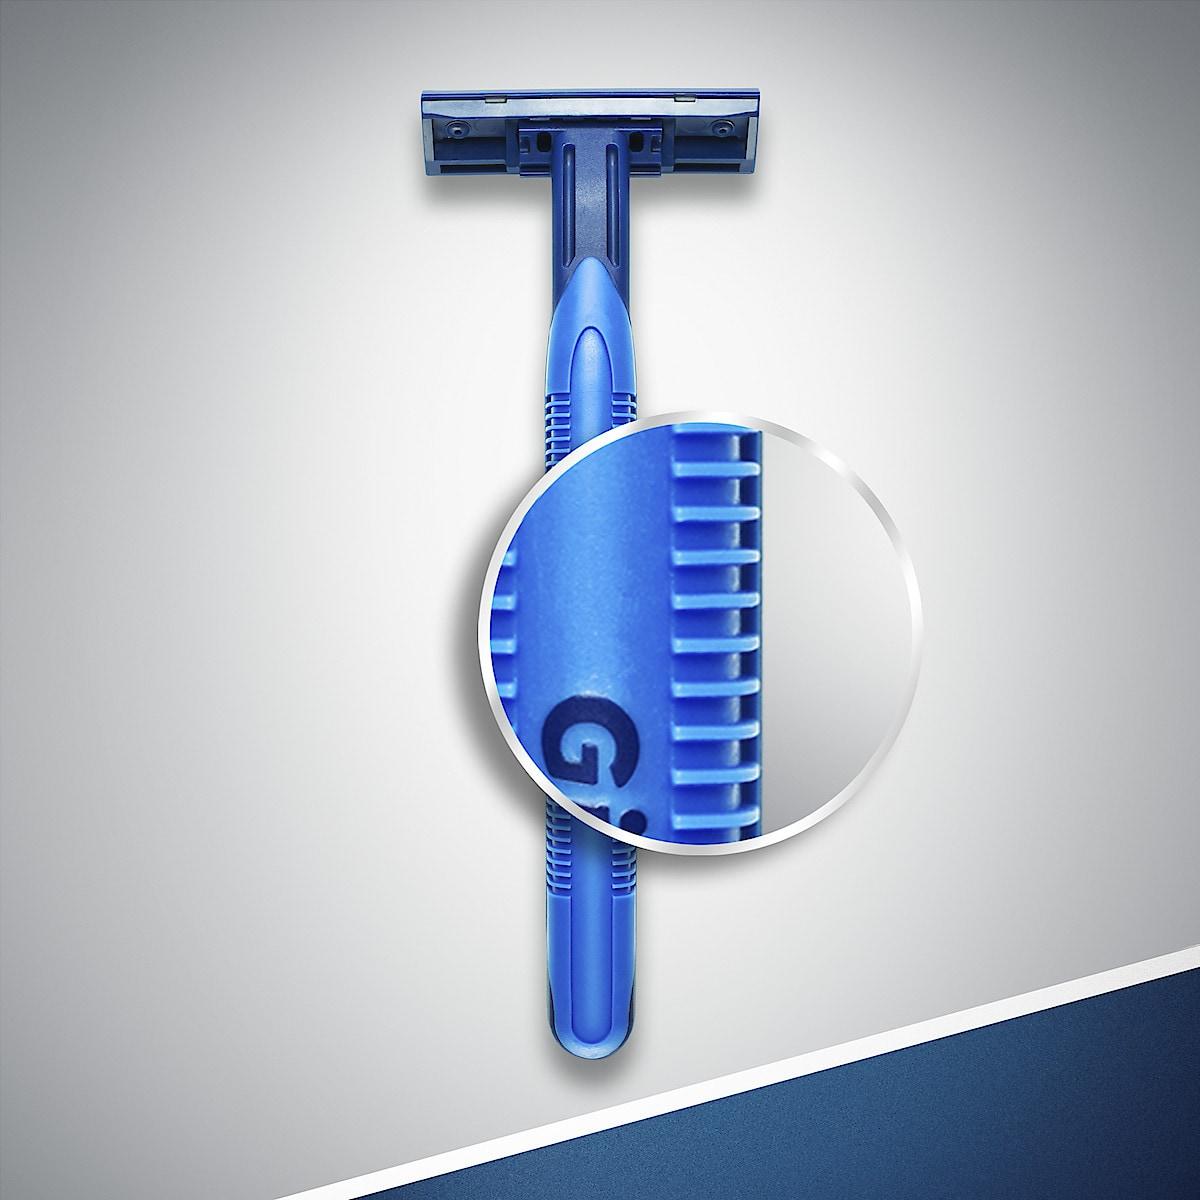 Pack of 10 Gillette Blue II Plus Slalom Disposable Razors